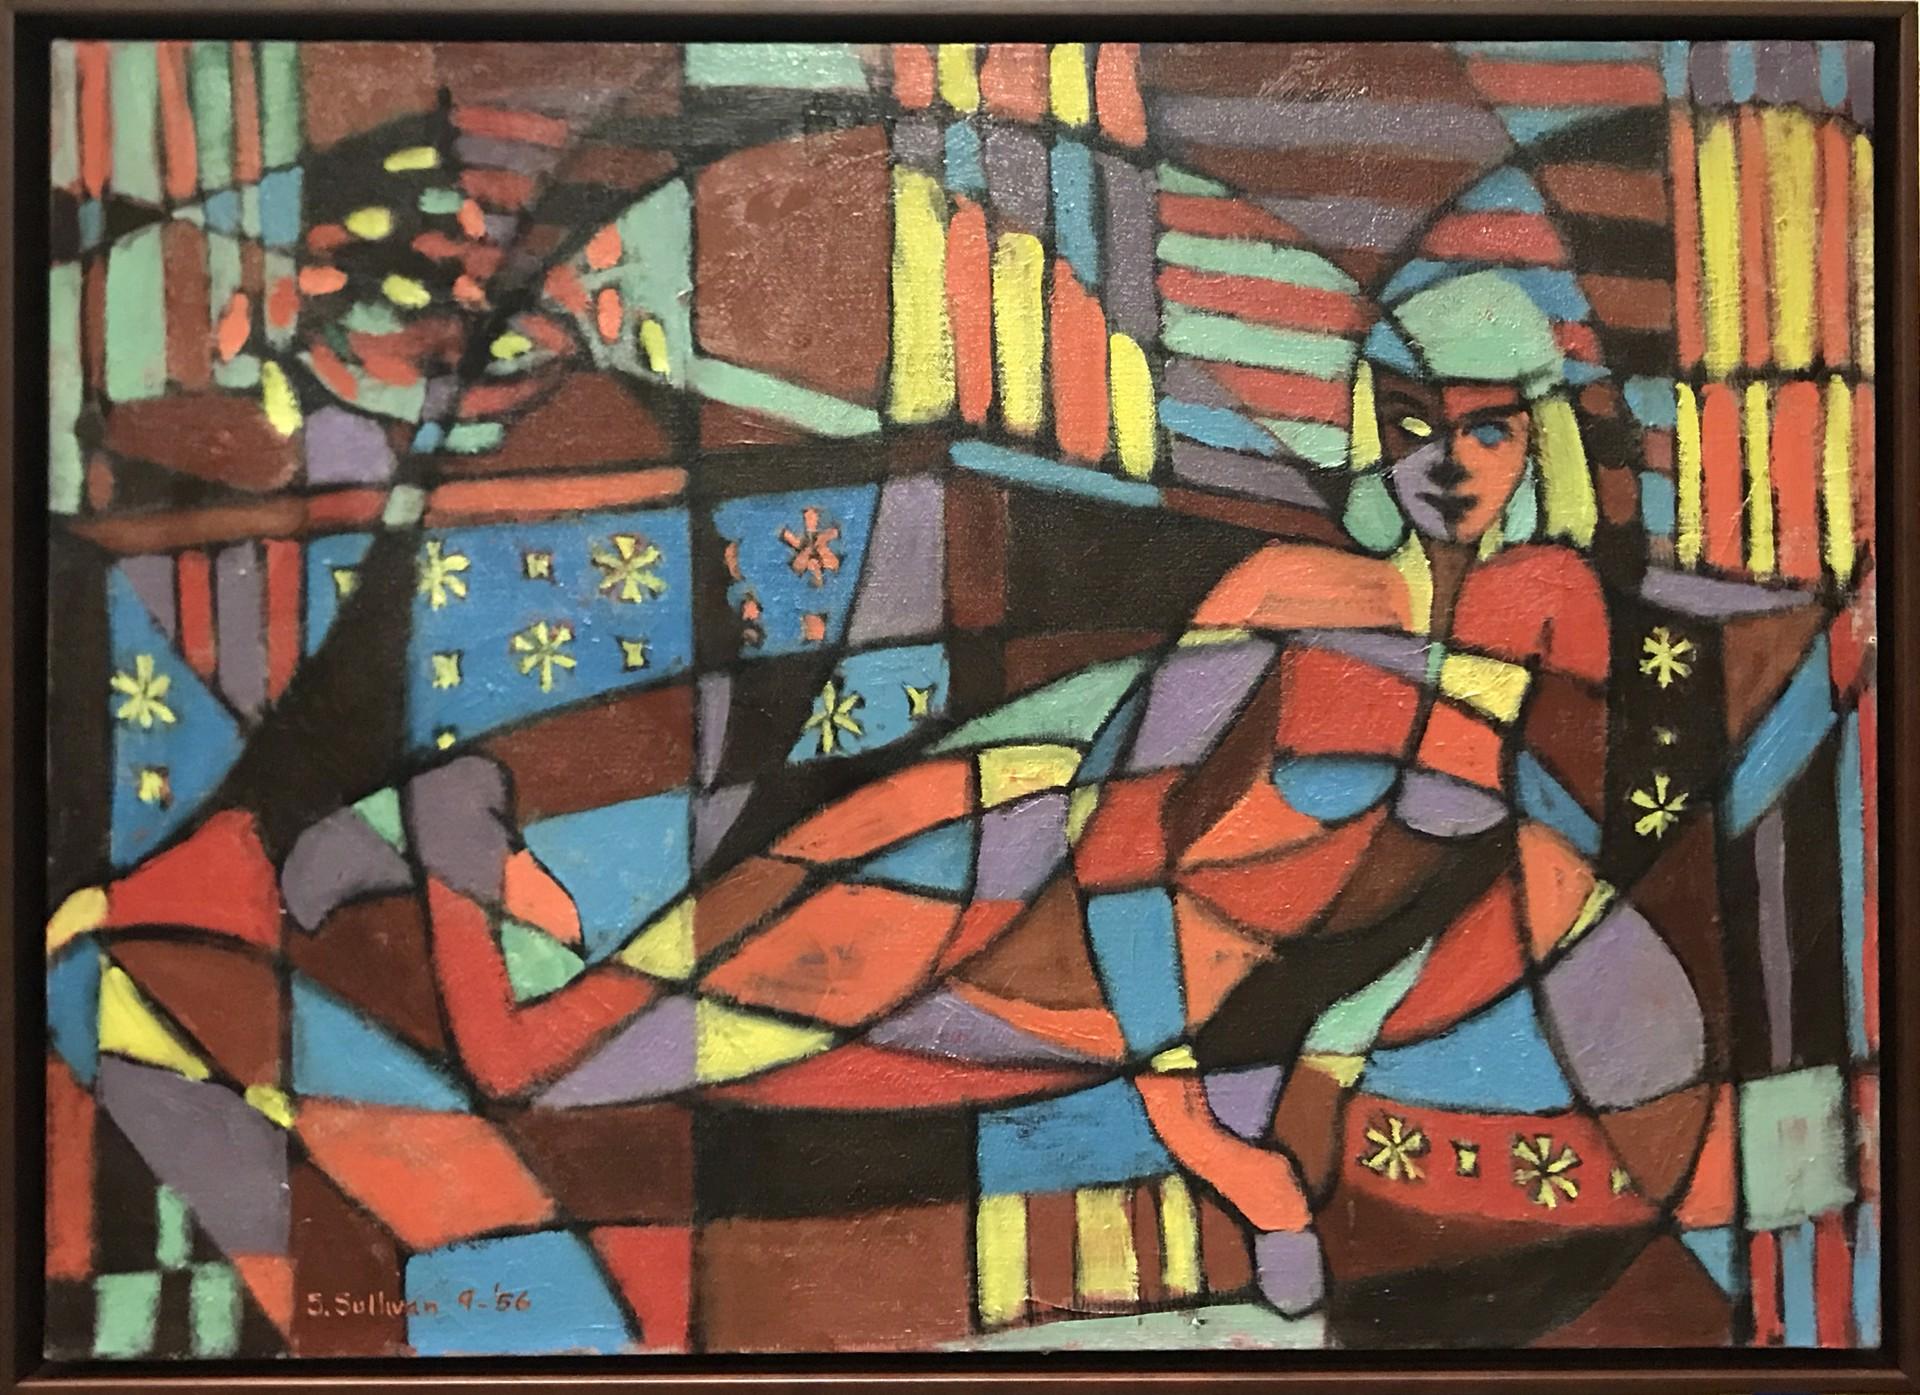 Reclining Figure by Stella Sullivan